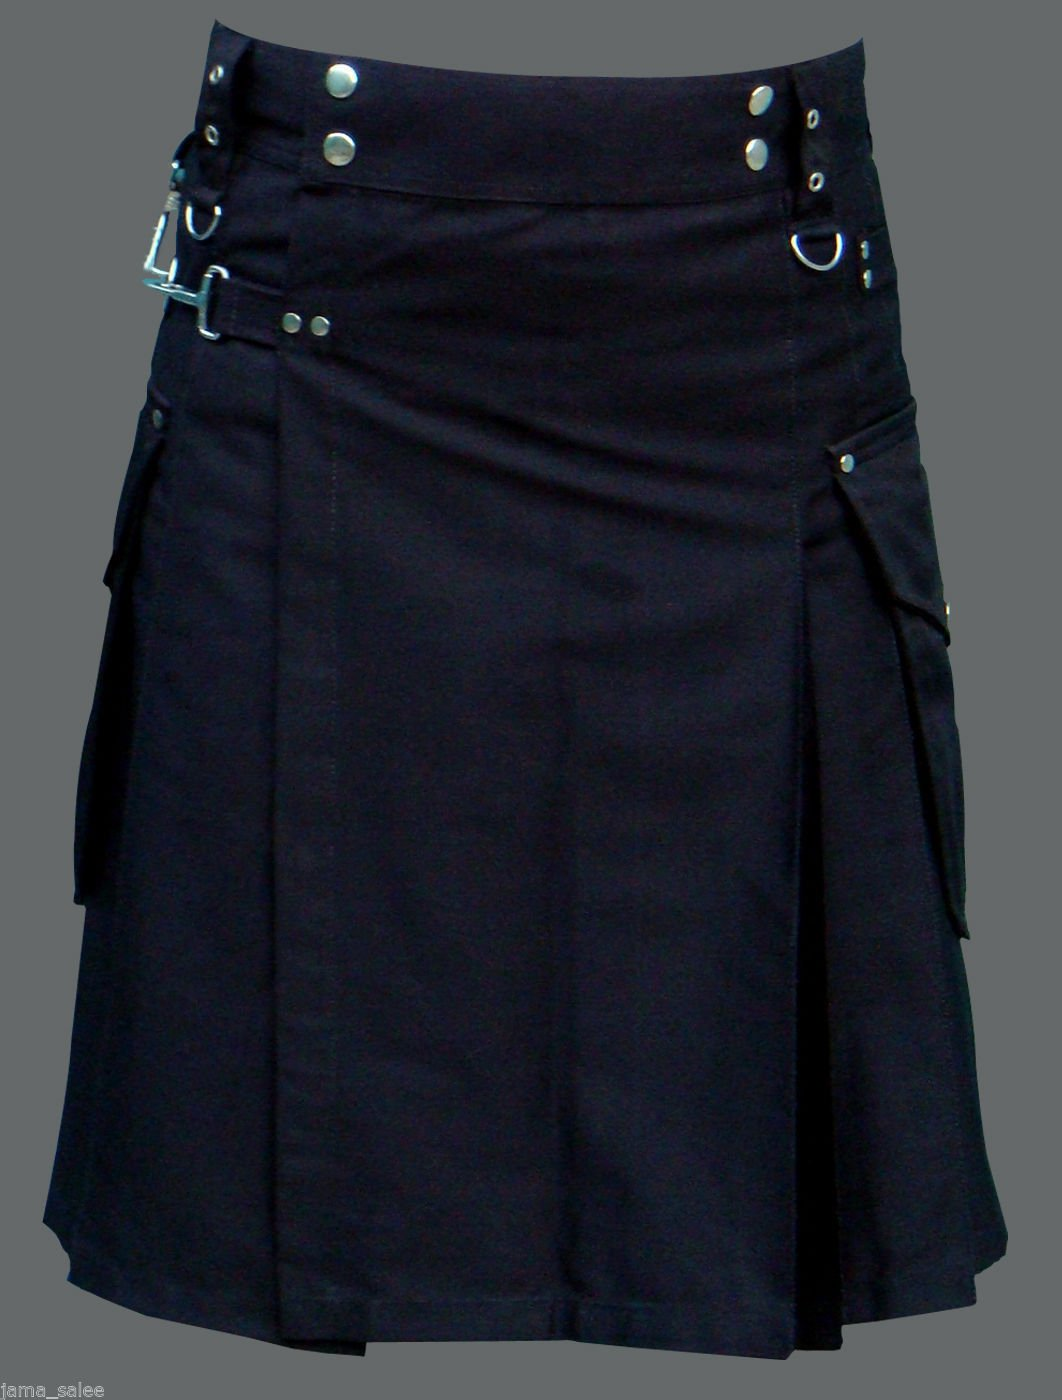 Deluxe Black Cotton Kilt Handmade Utility Gothic Modern Kilt with Cargo Pockets Waist Size 50 to Fit